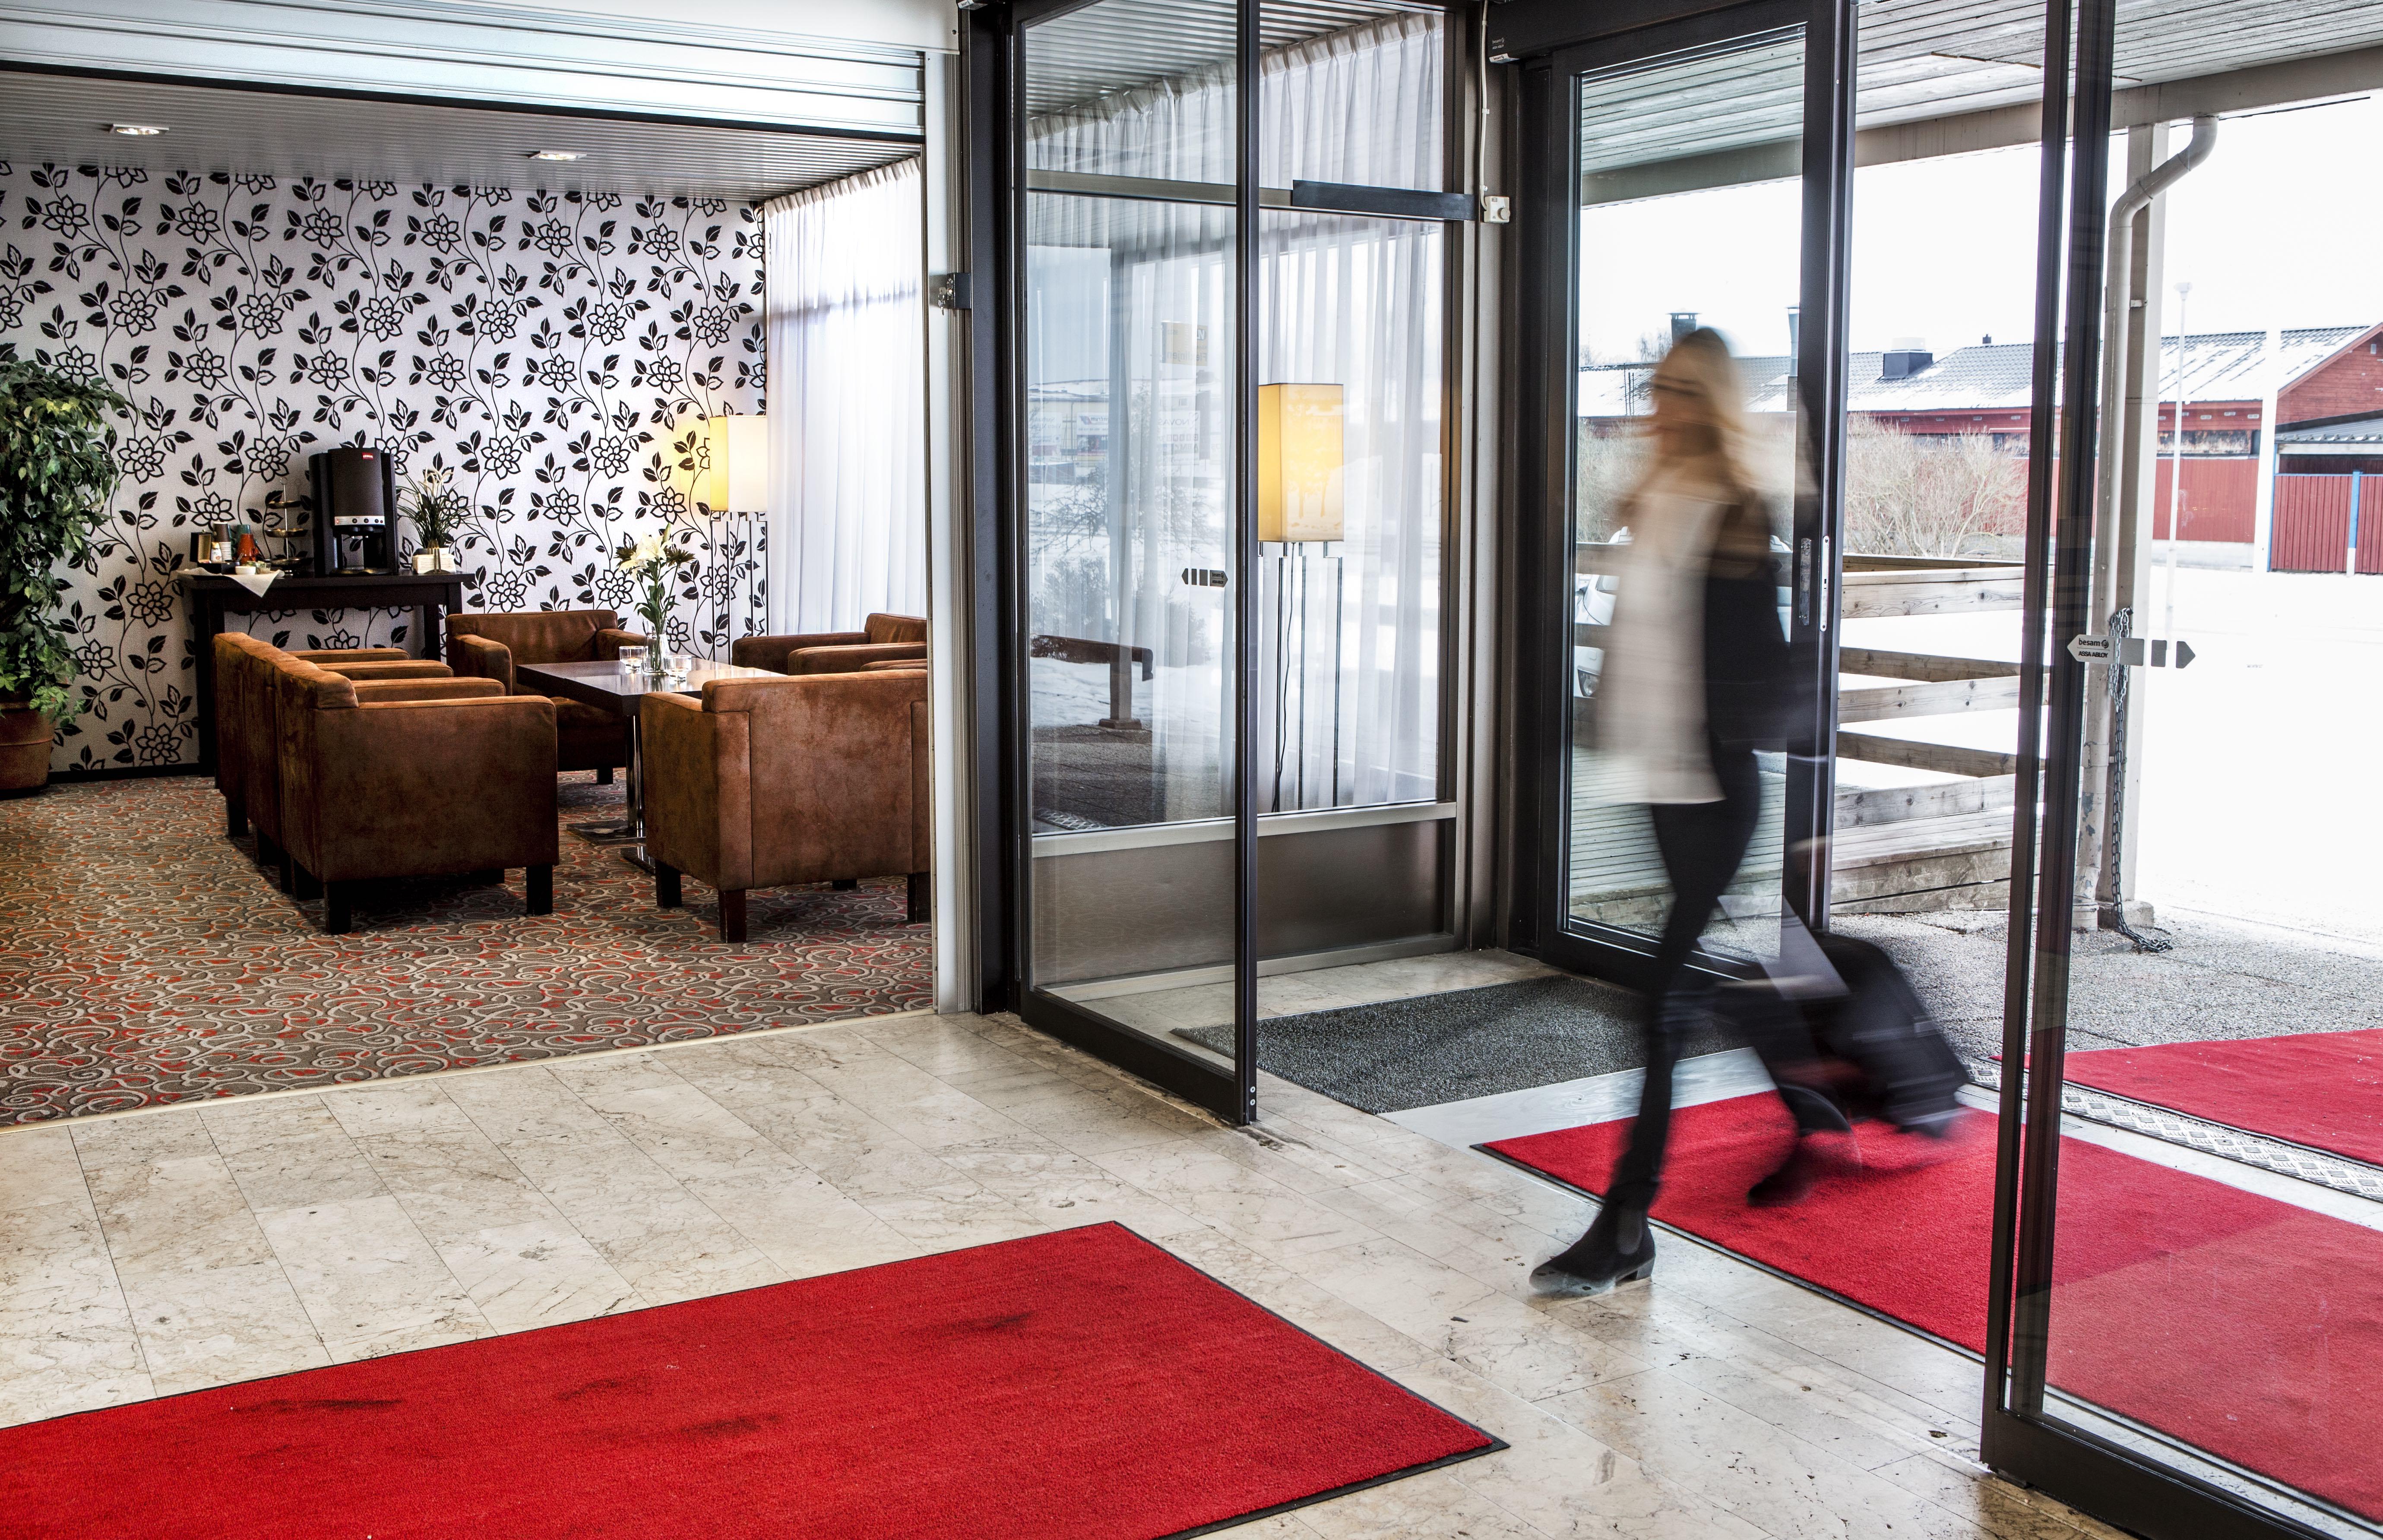 A business woman walking inside Hotel Scheele.